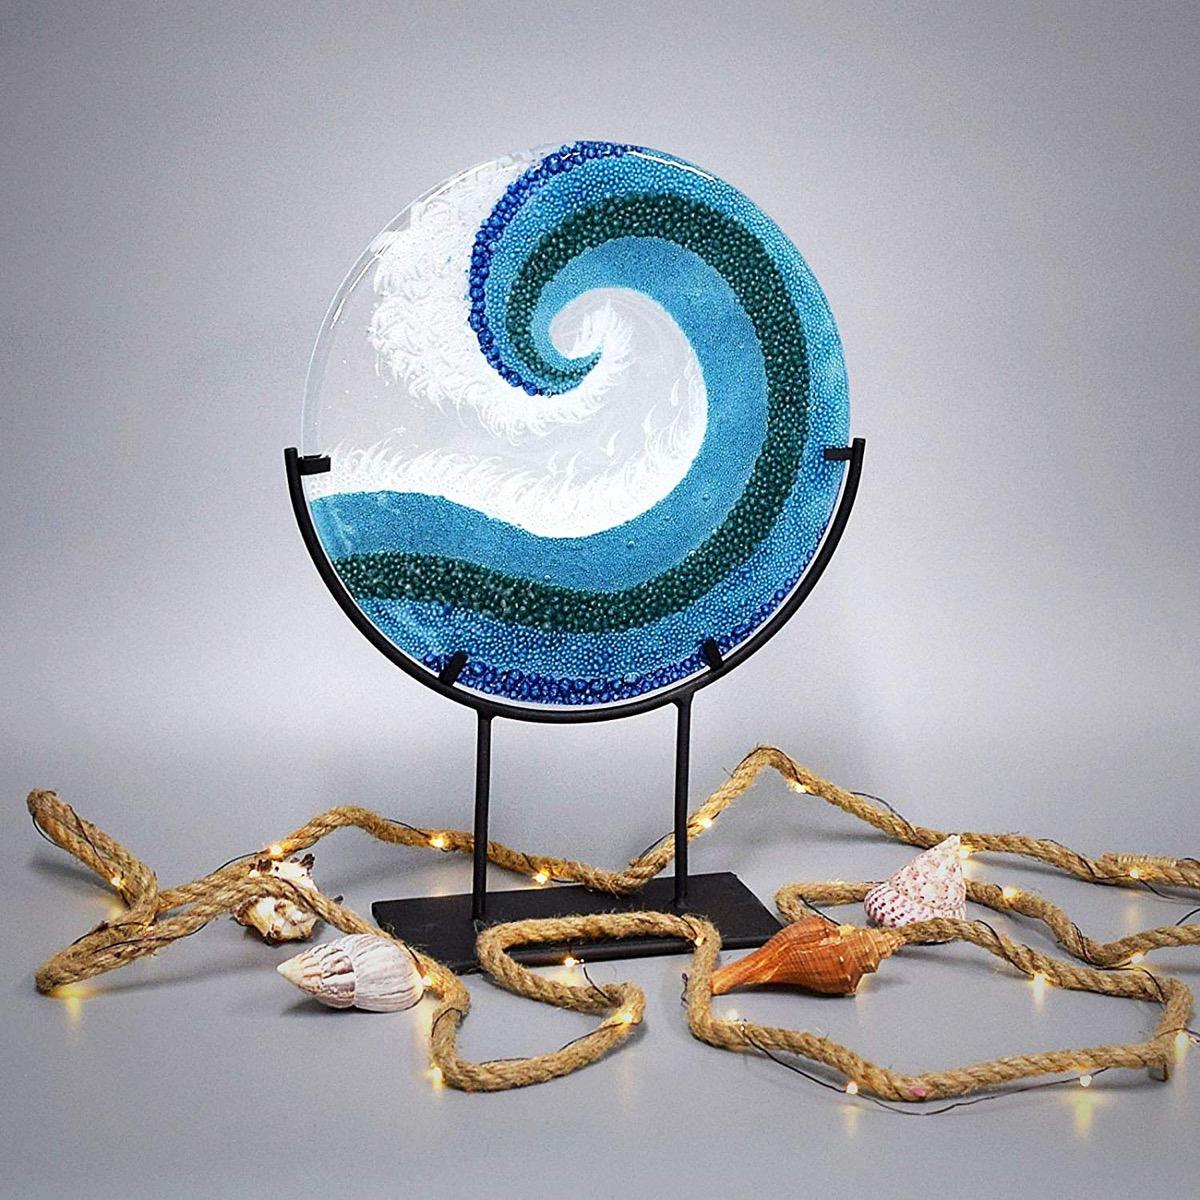 Crashing Waves Statue {Handmade Items From Amazon}